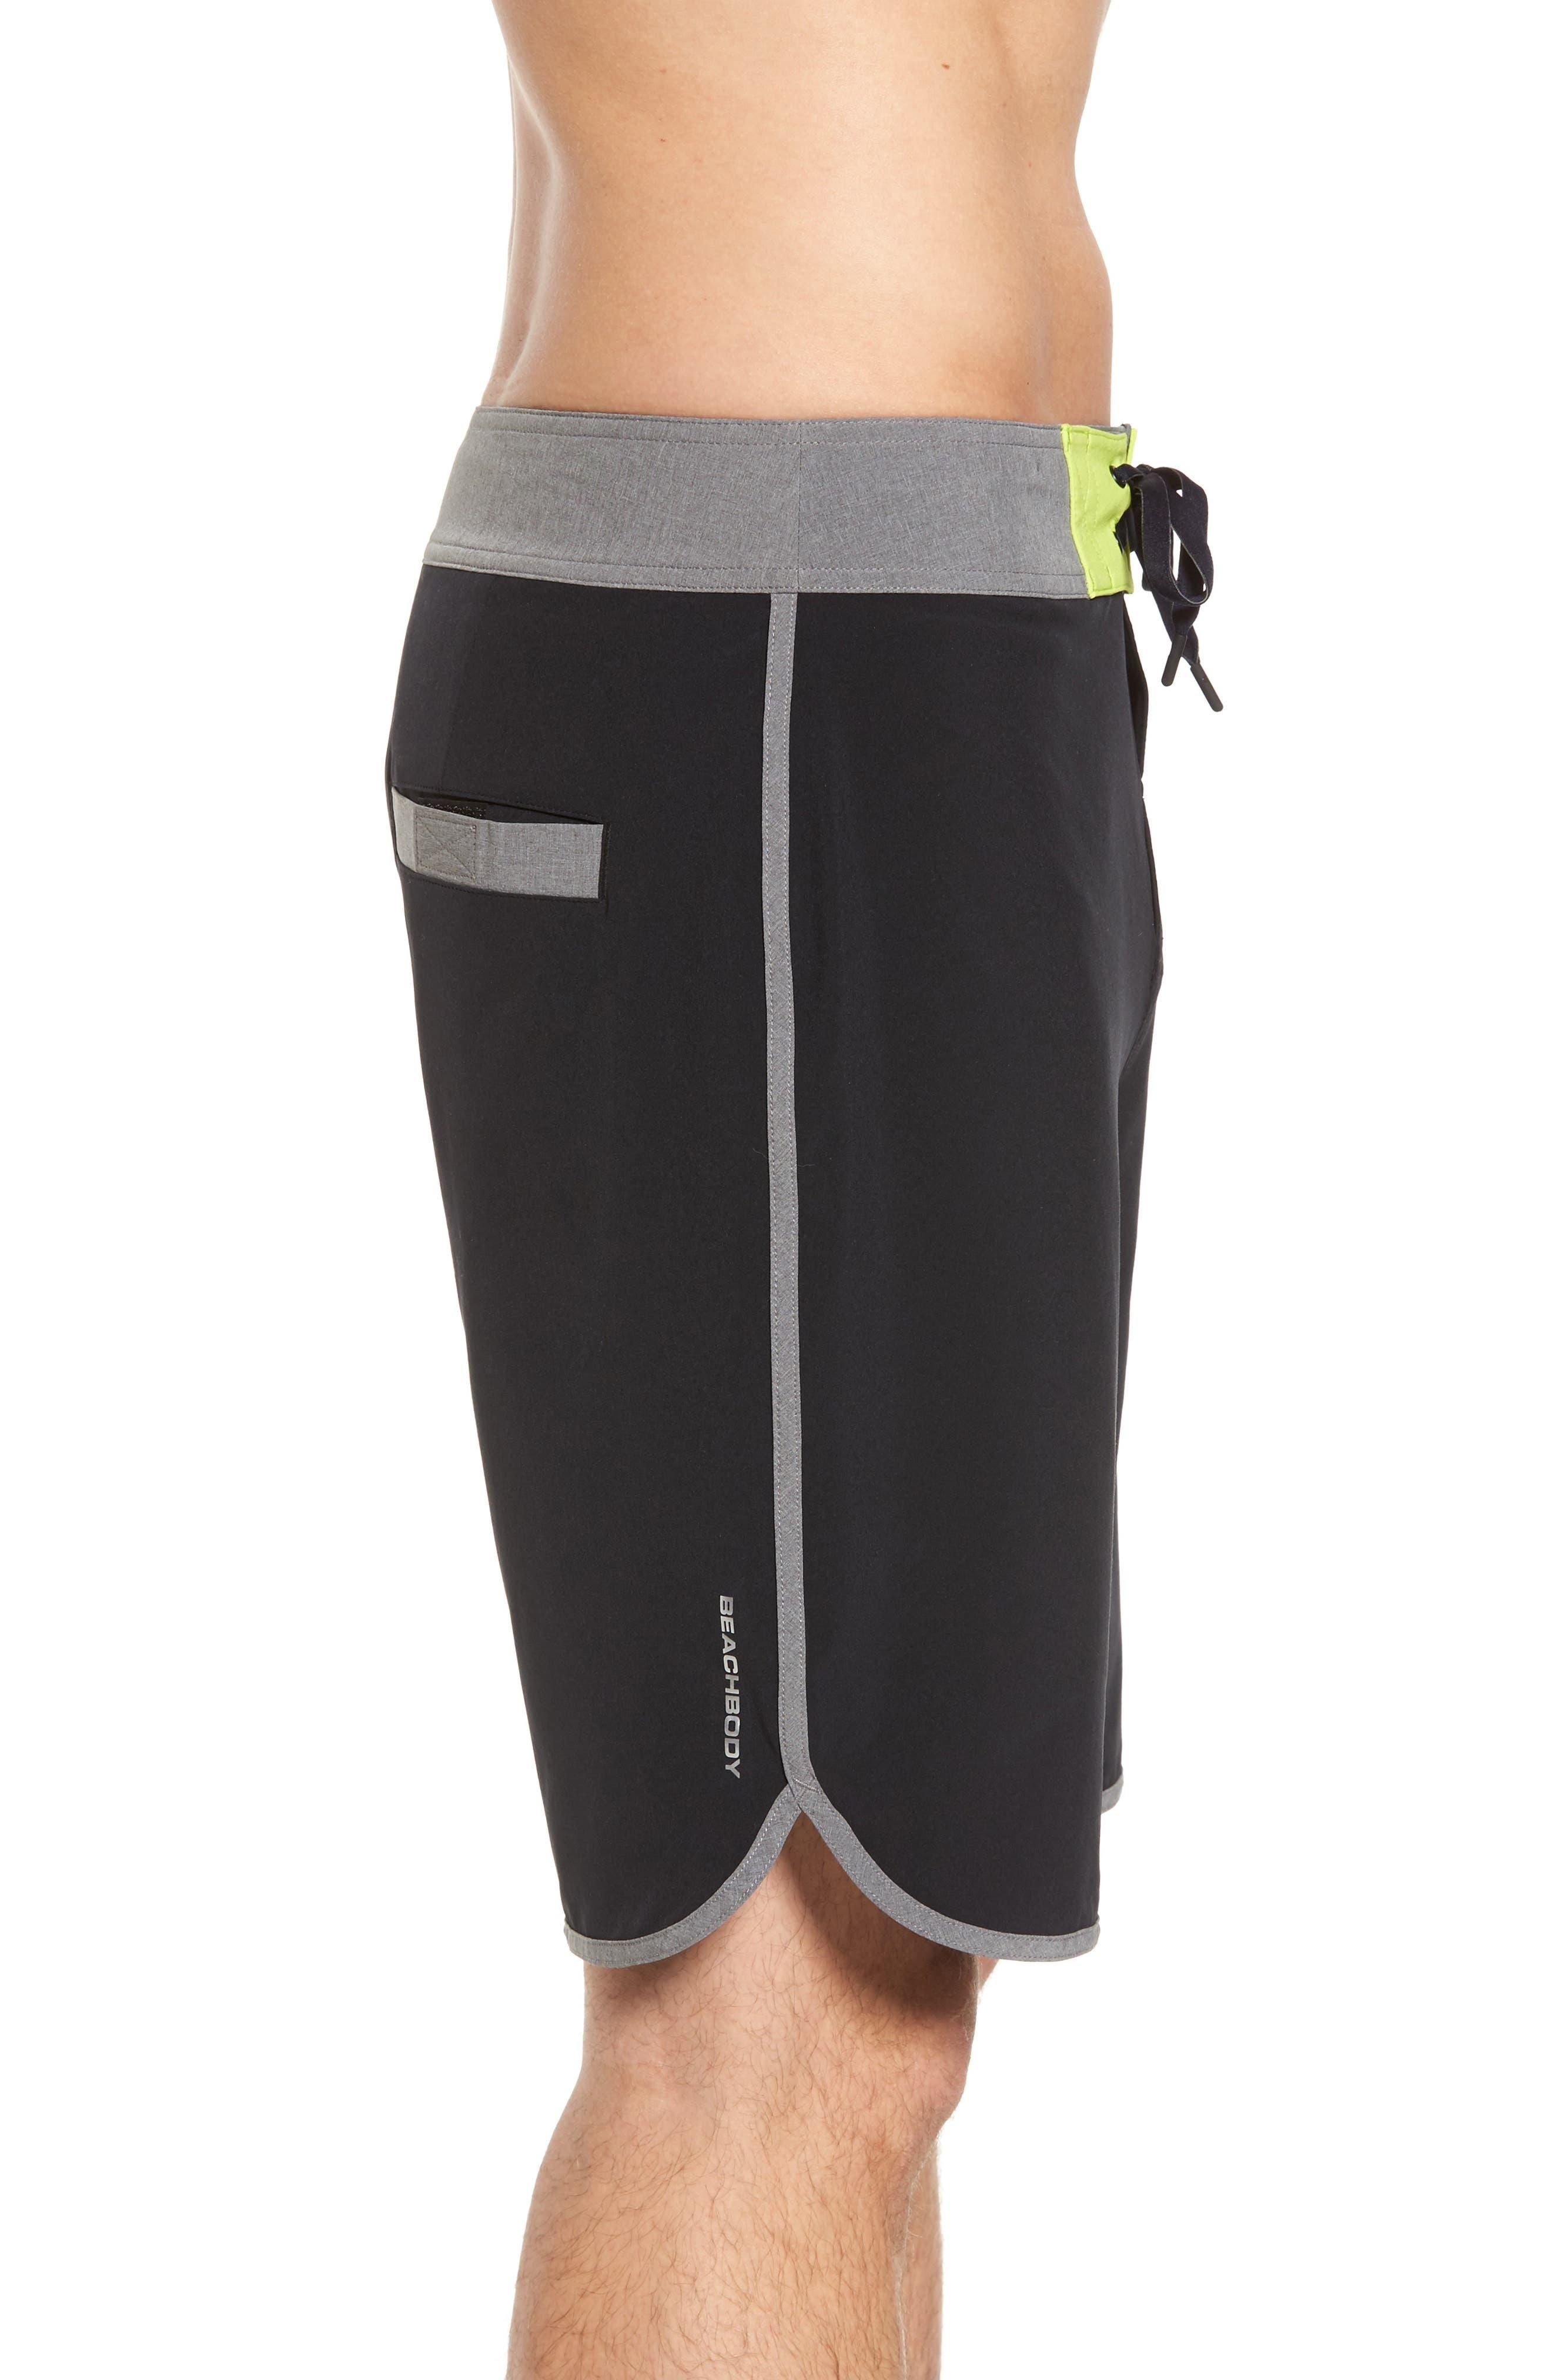 Flex Hybrid Athletic Shorts,                             Alternate thumbnail 3, color,                             Black